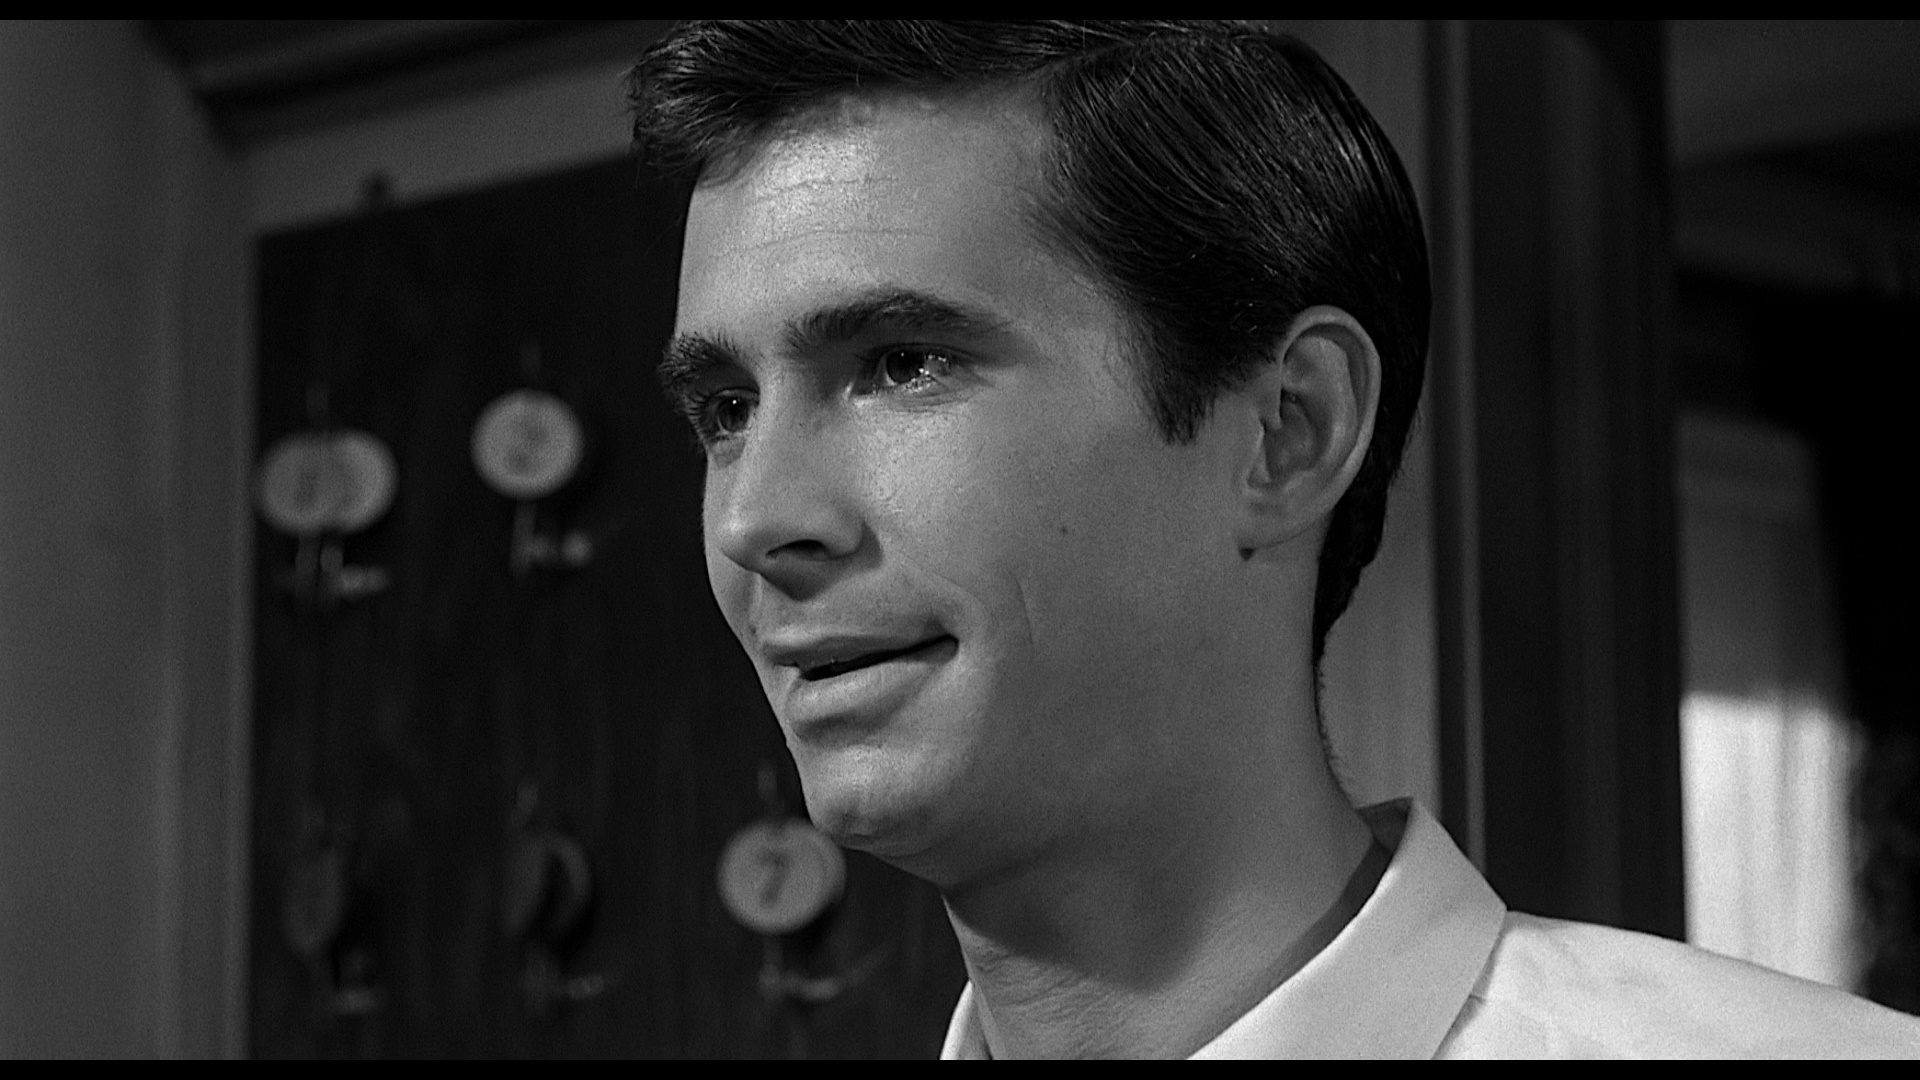 Psycho 1960 Norman Bates 32159 Loadtve